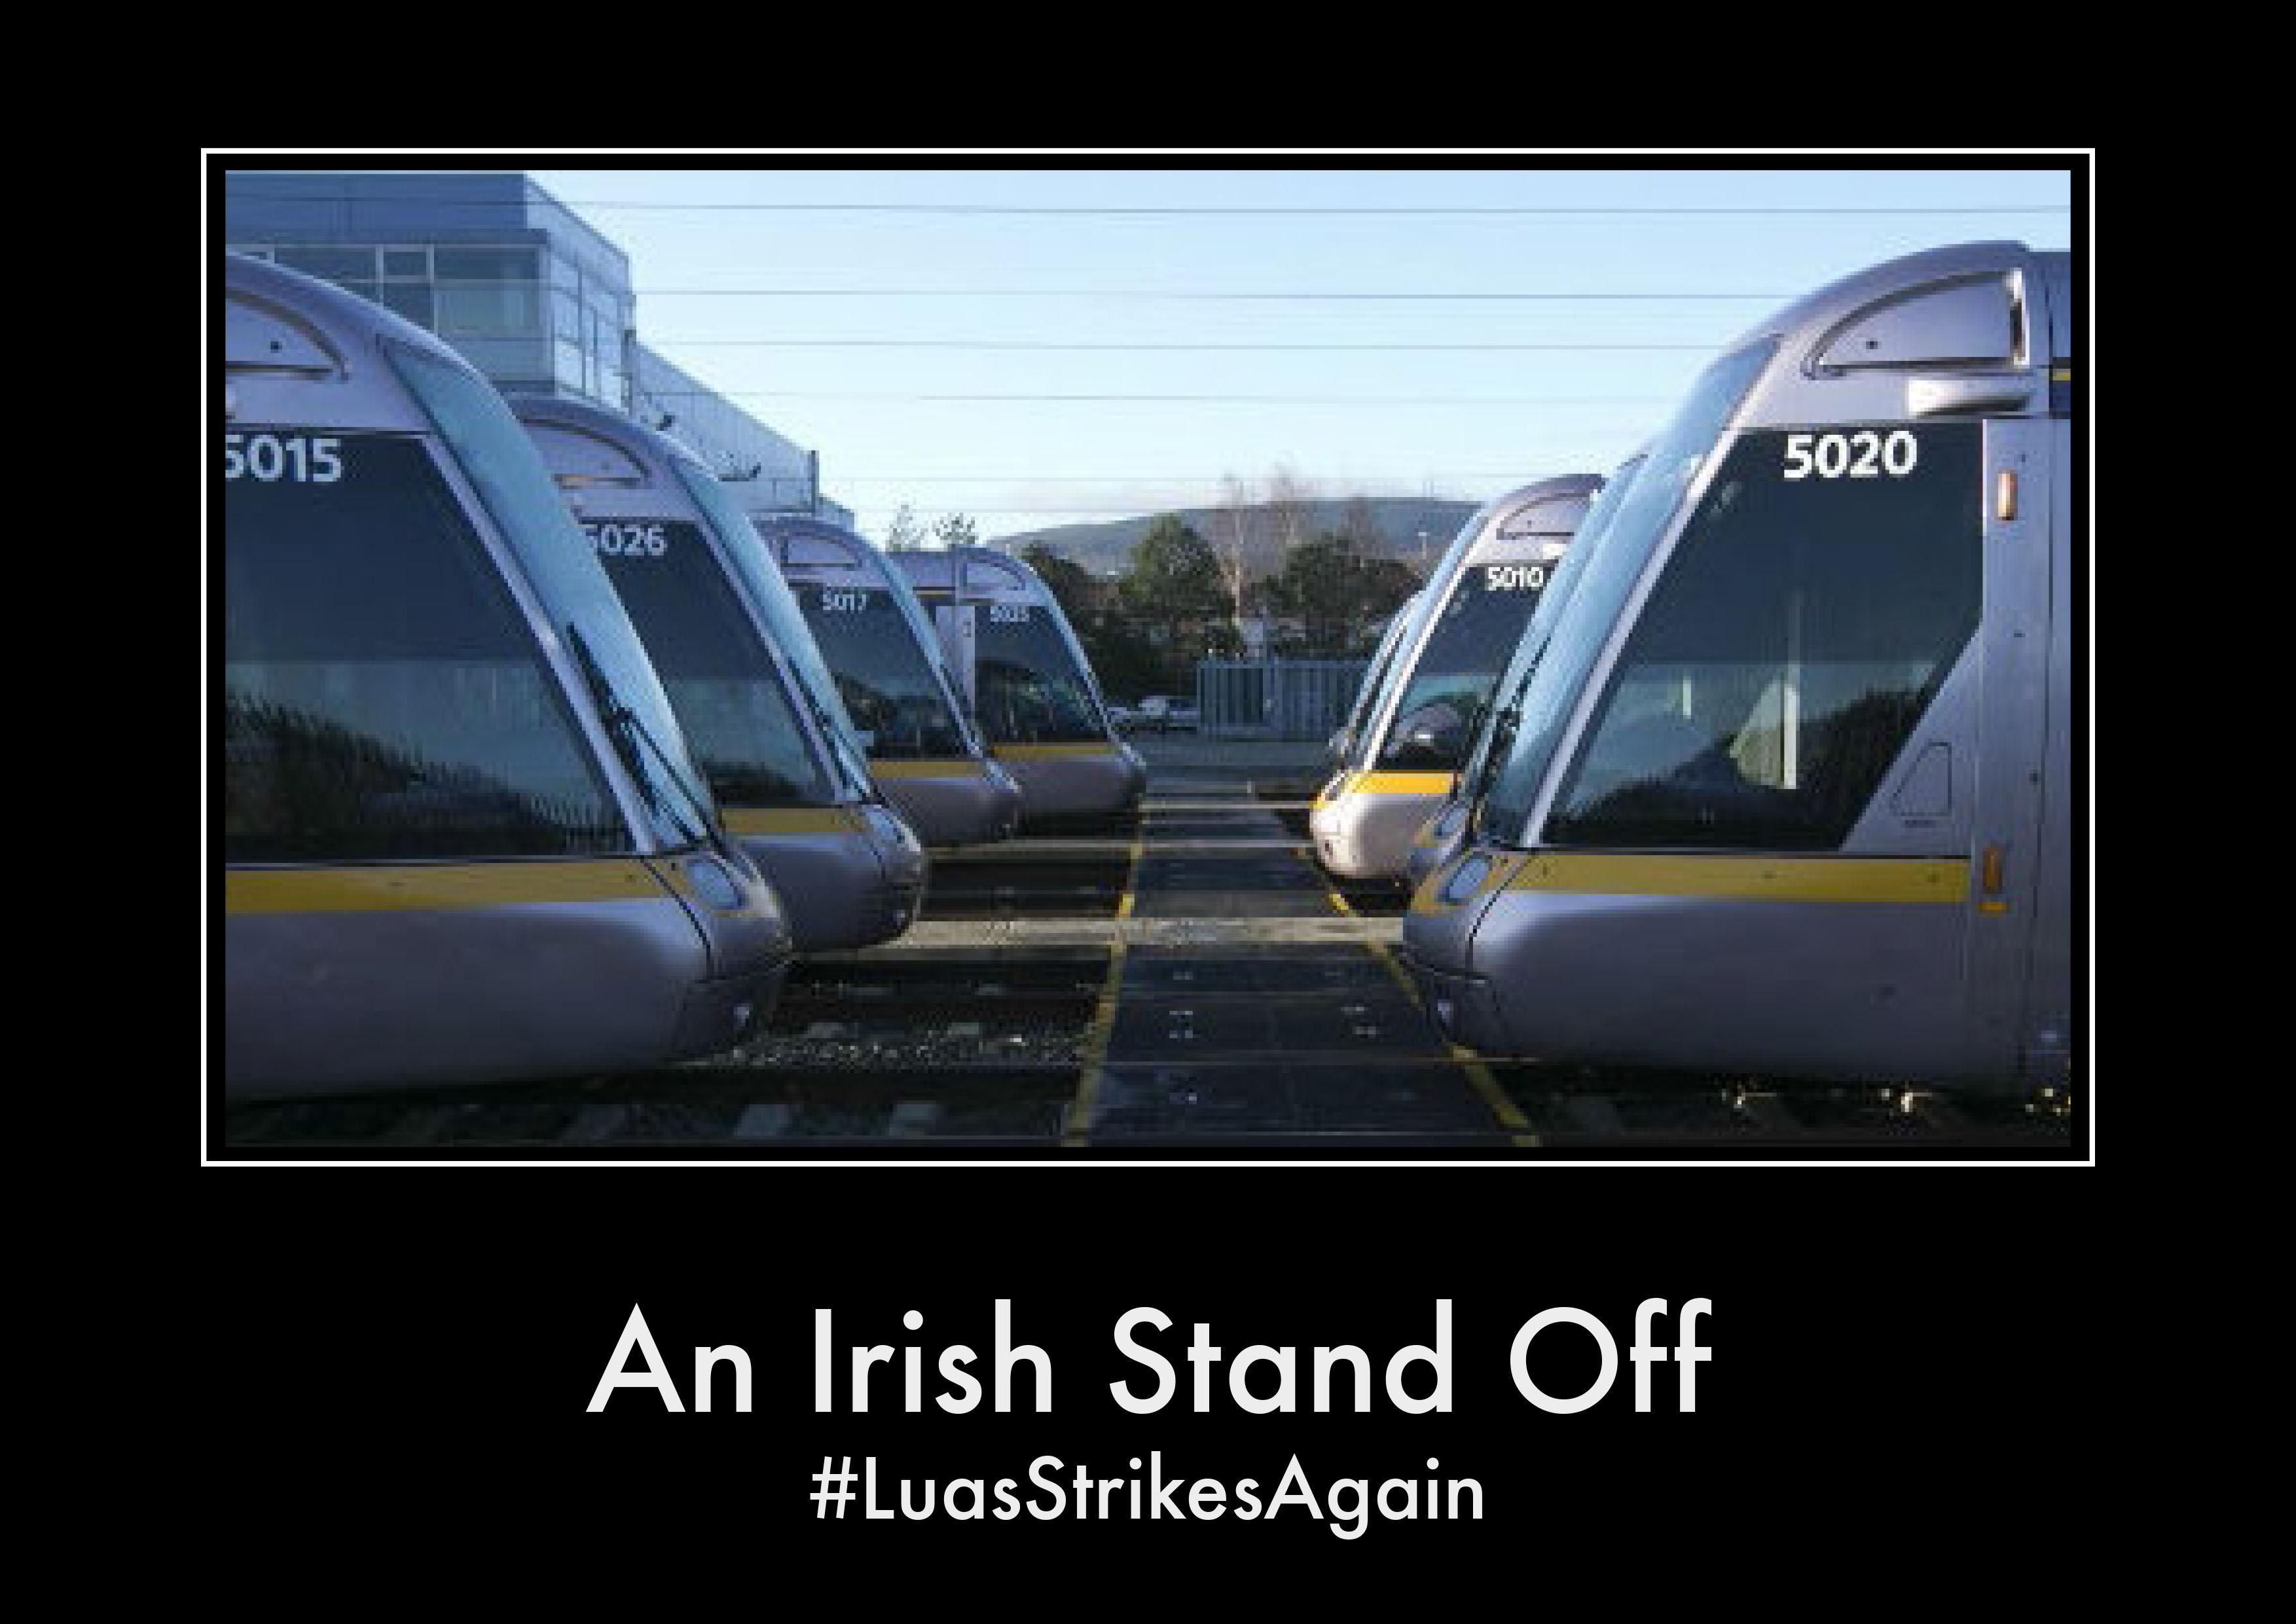 IrishStandOff